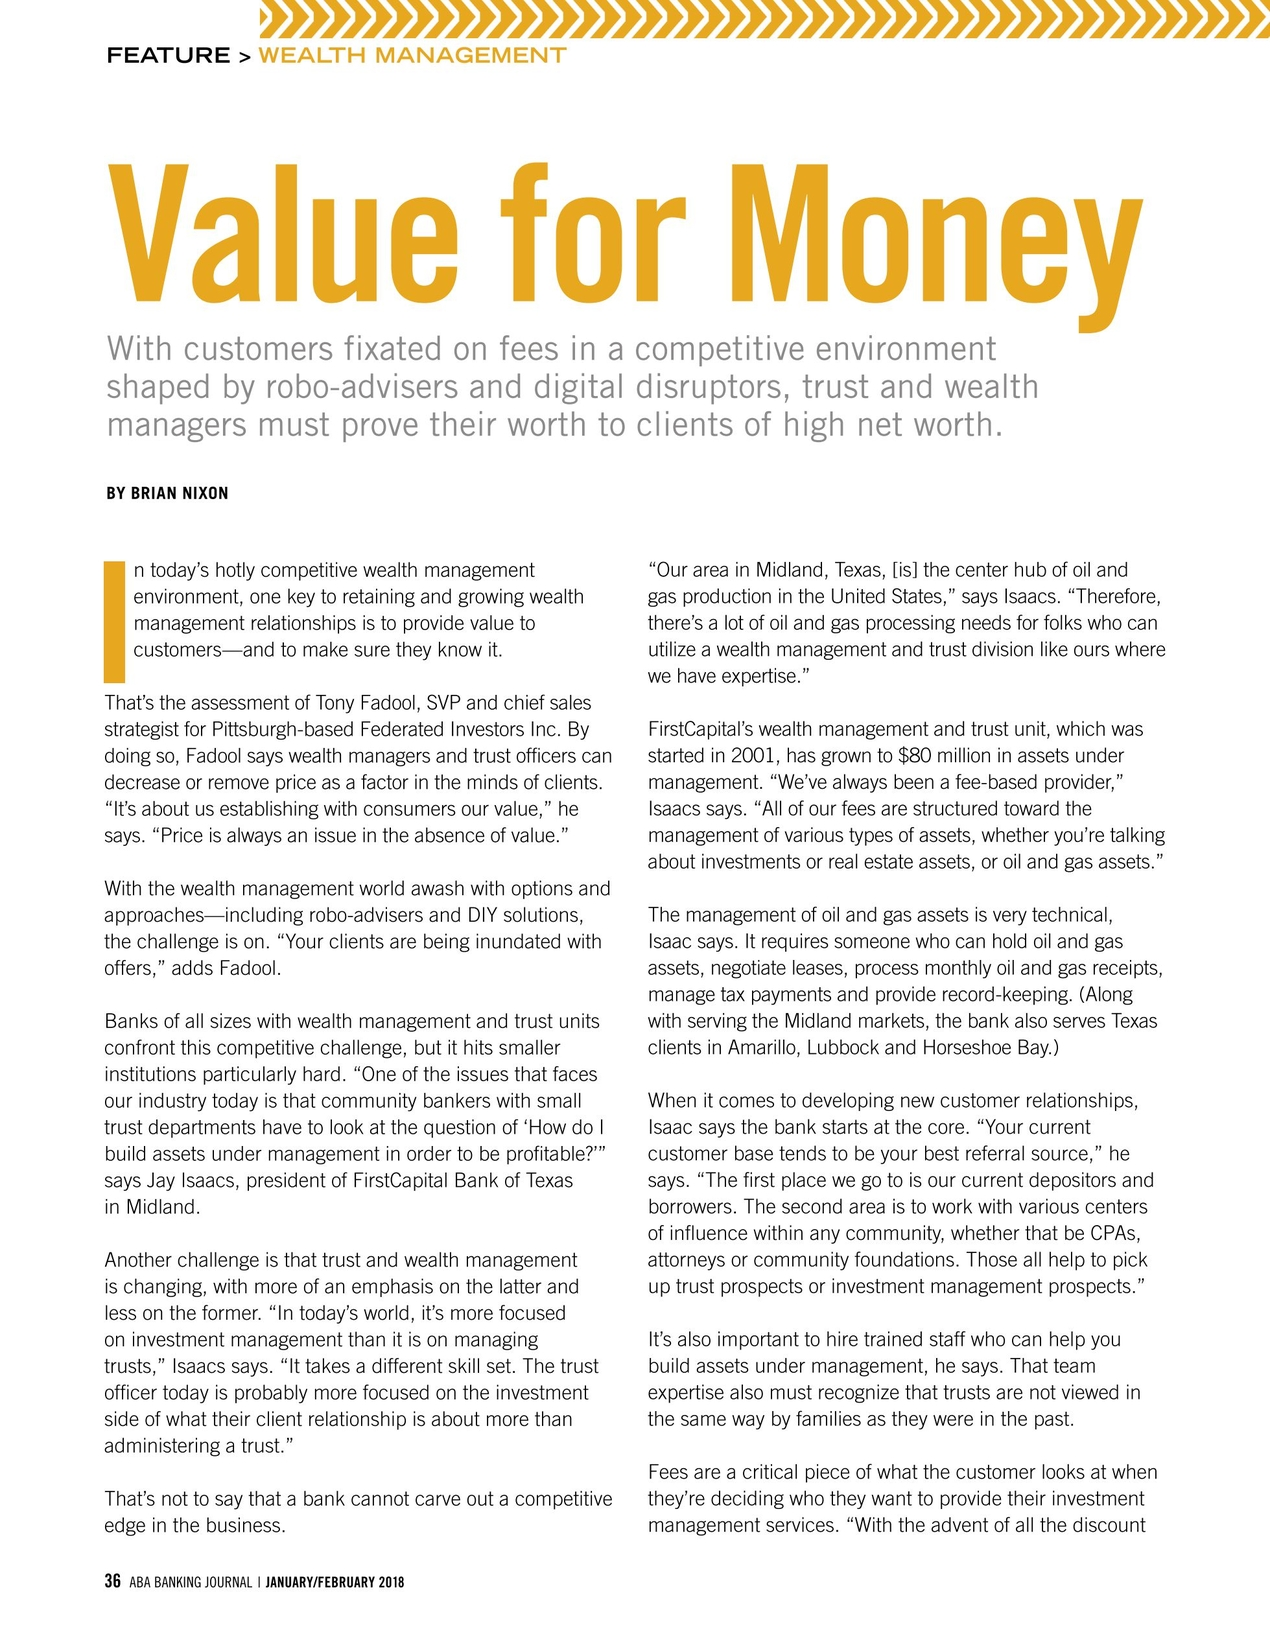 aba banking journal january february 2018